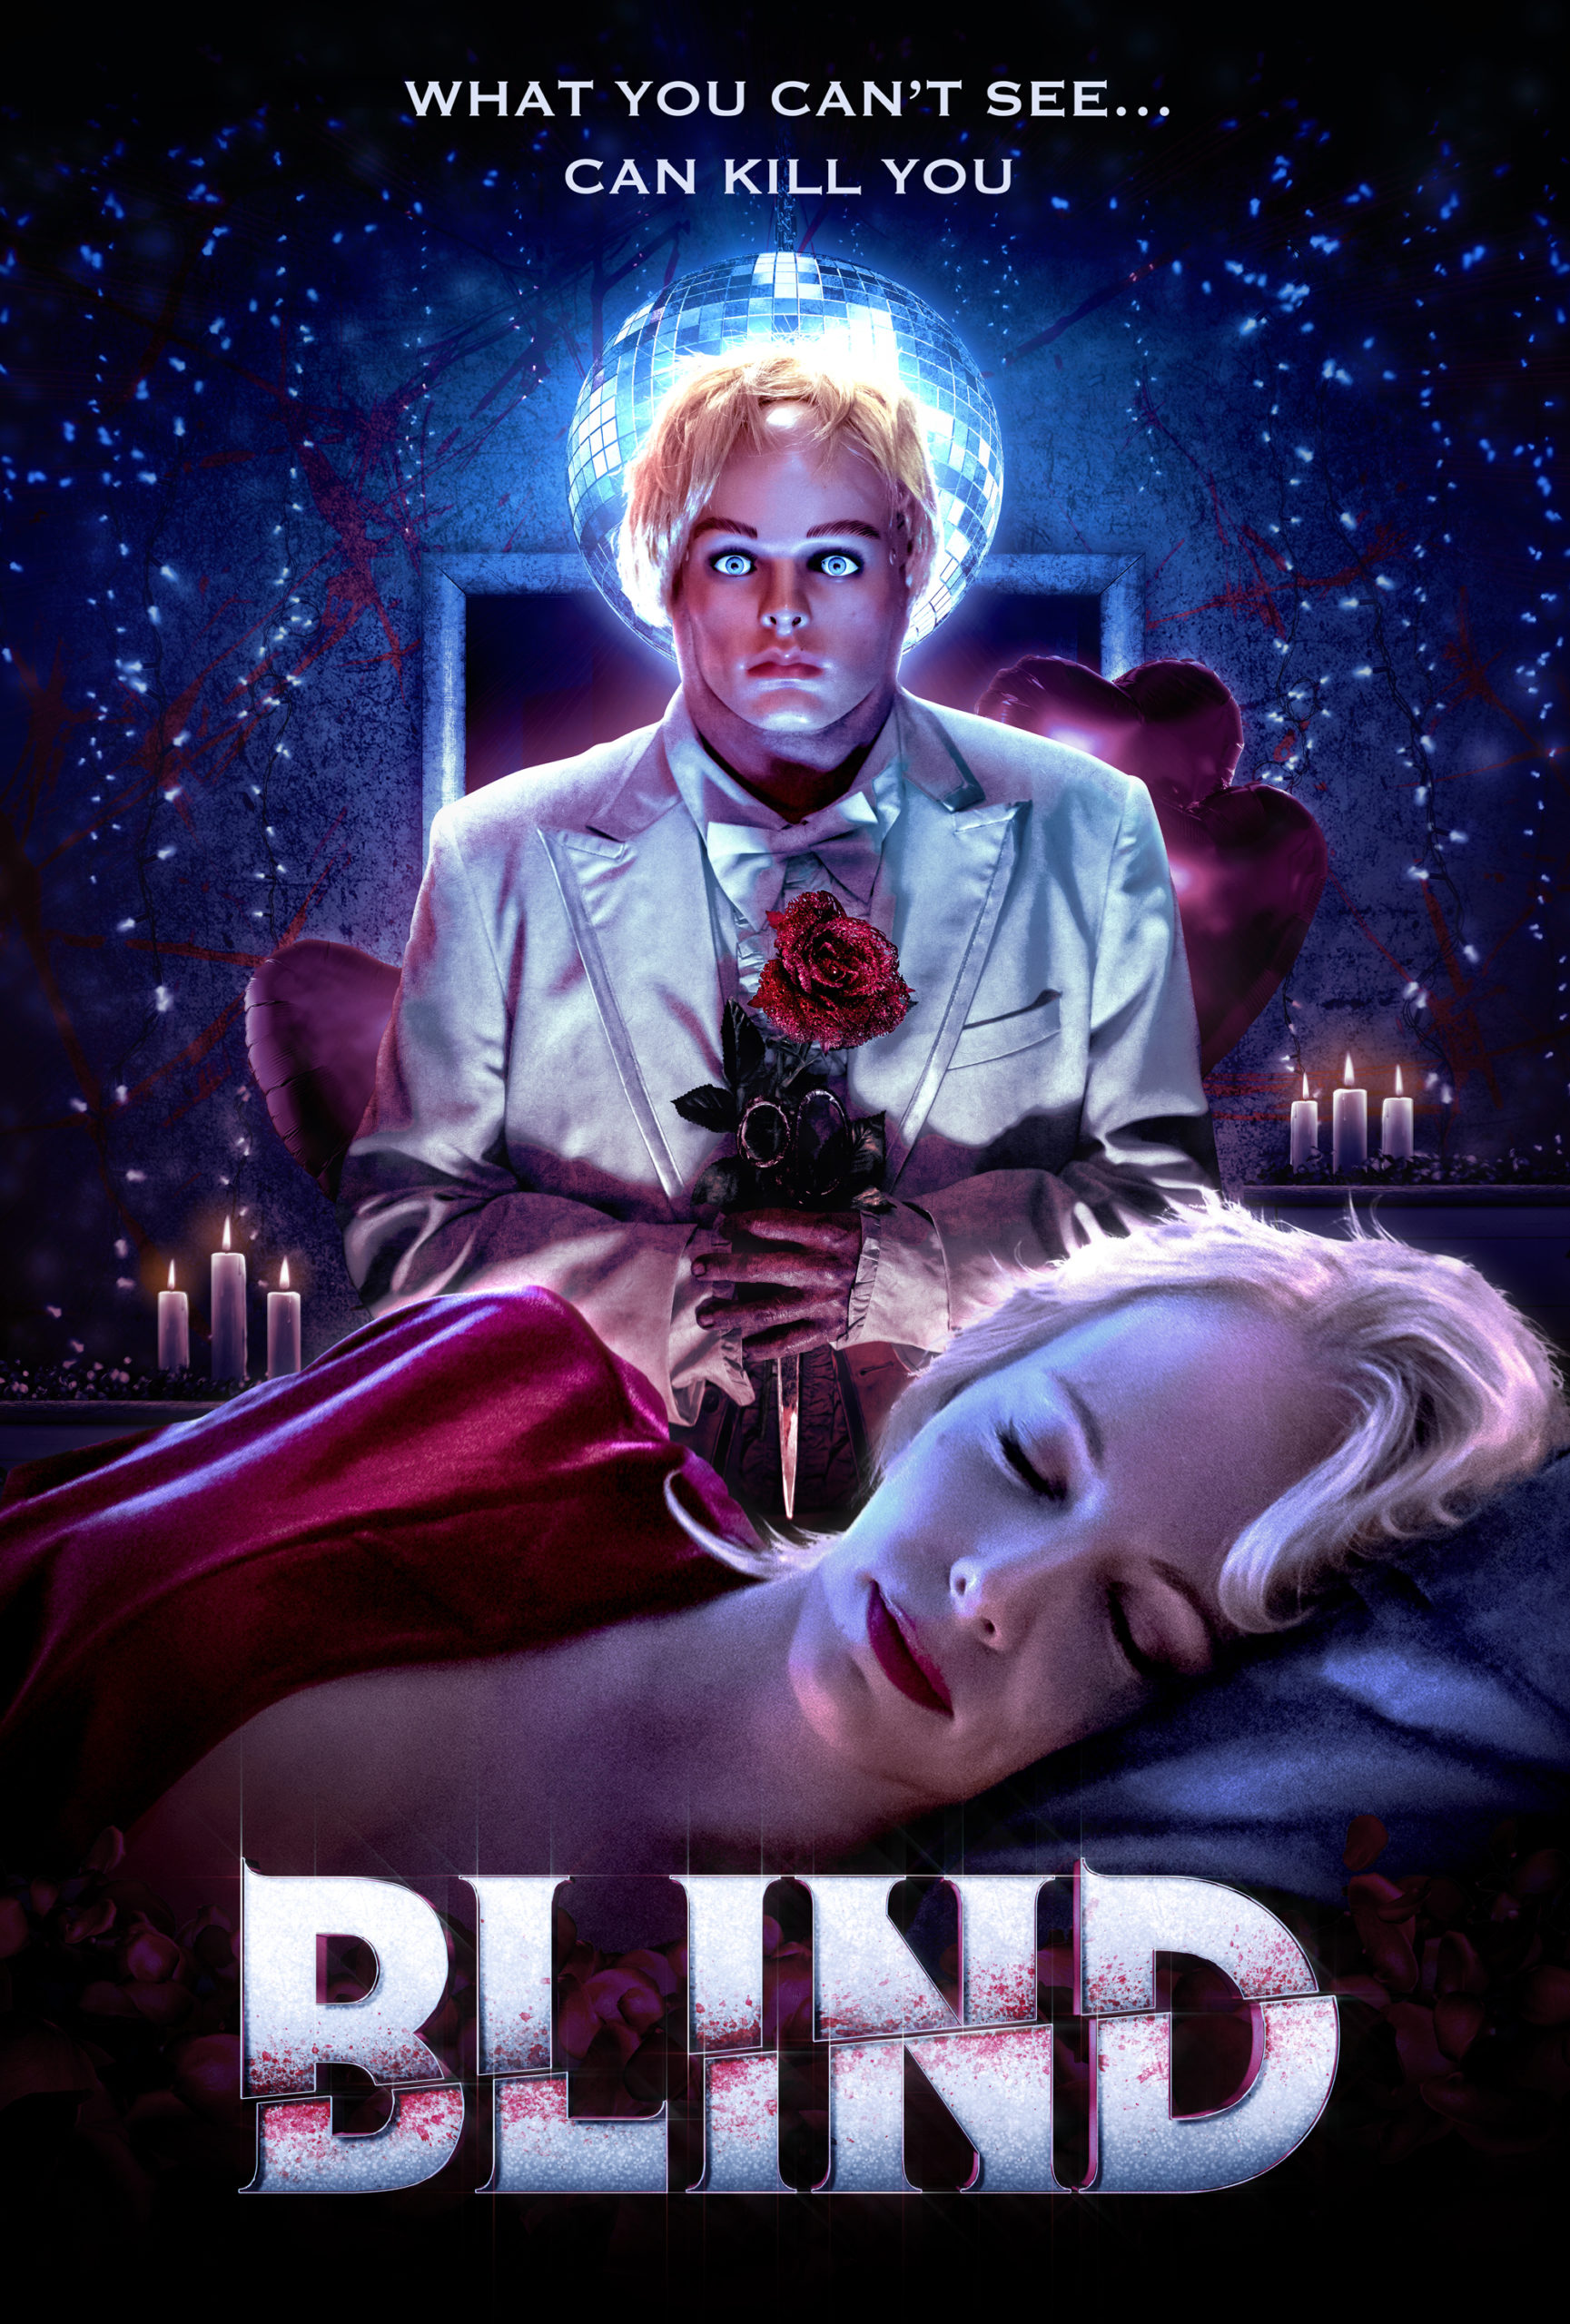 blind movie poster